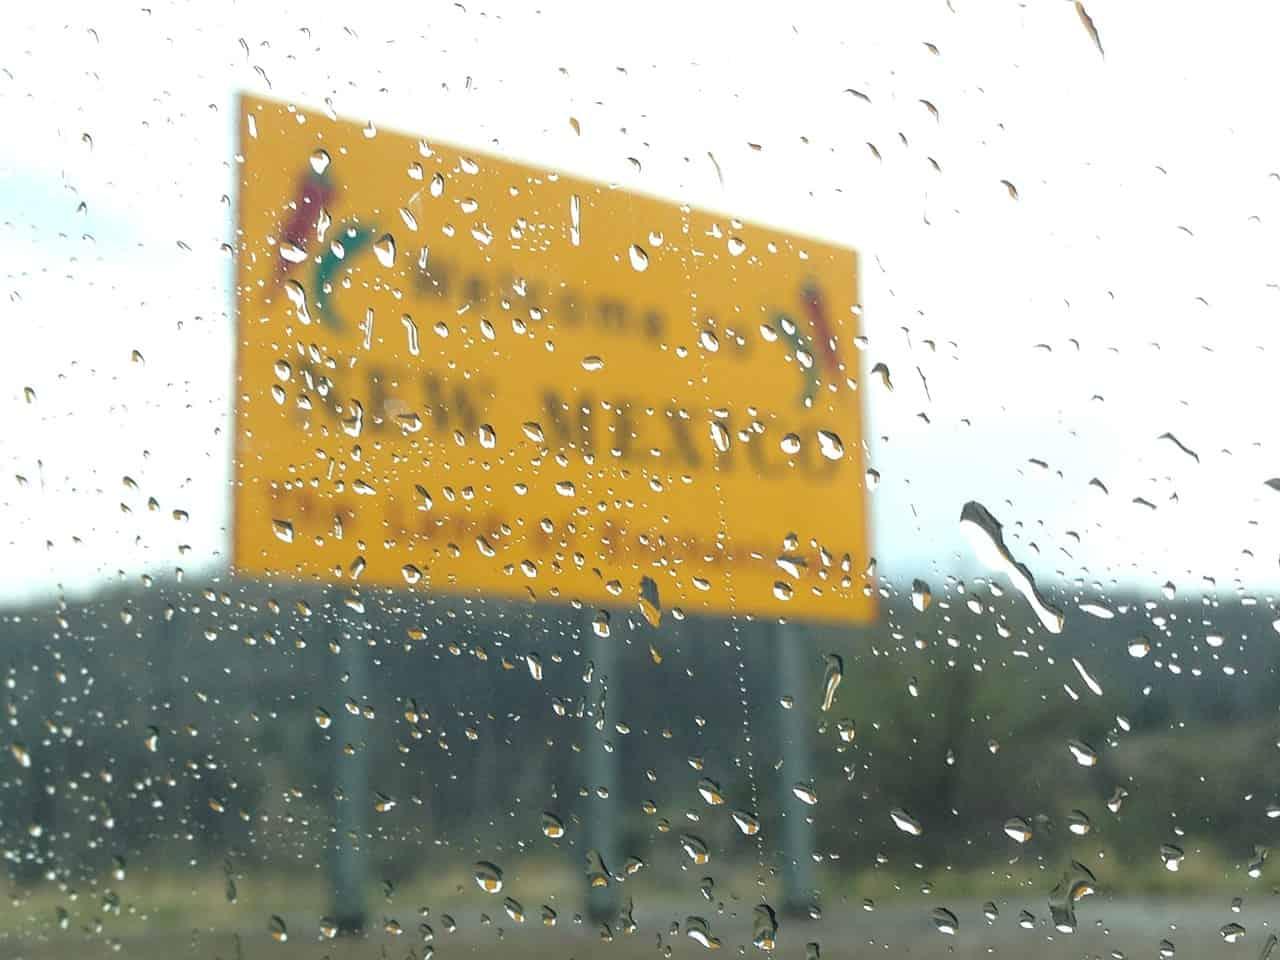 Ignition interlock law in New Mexico